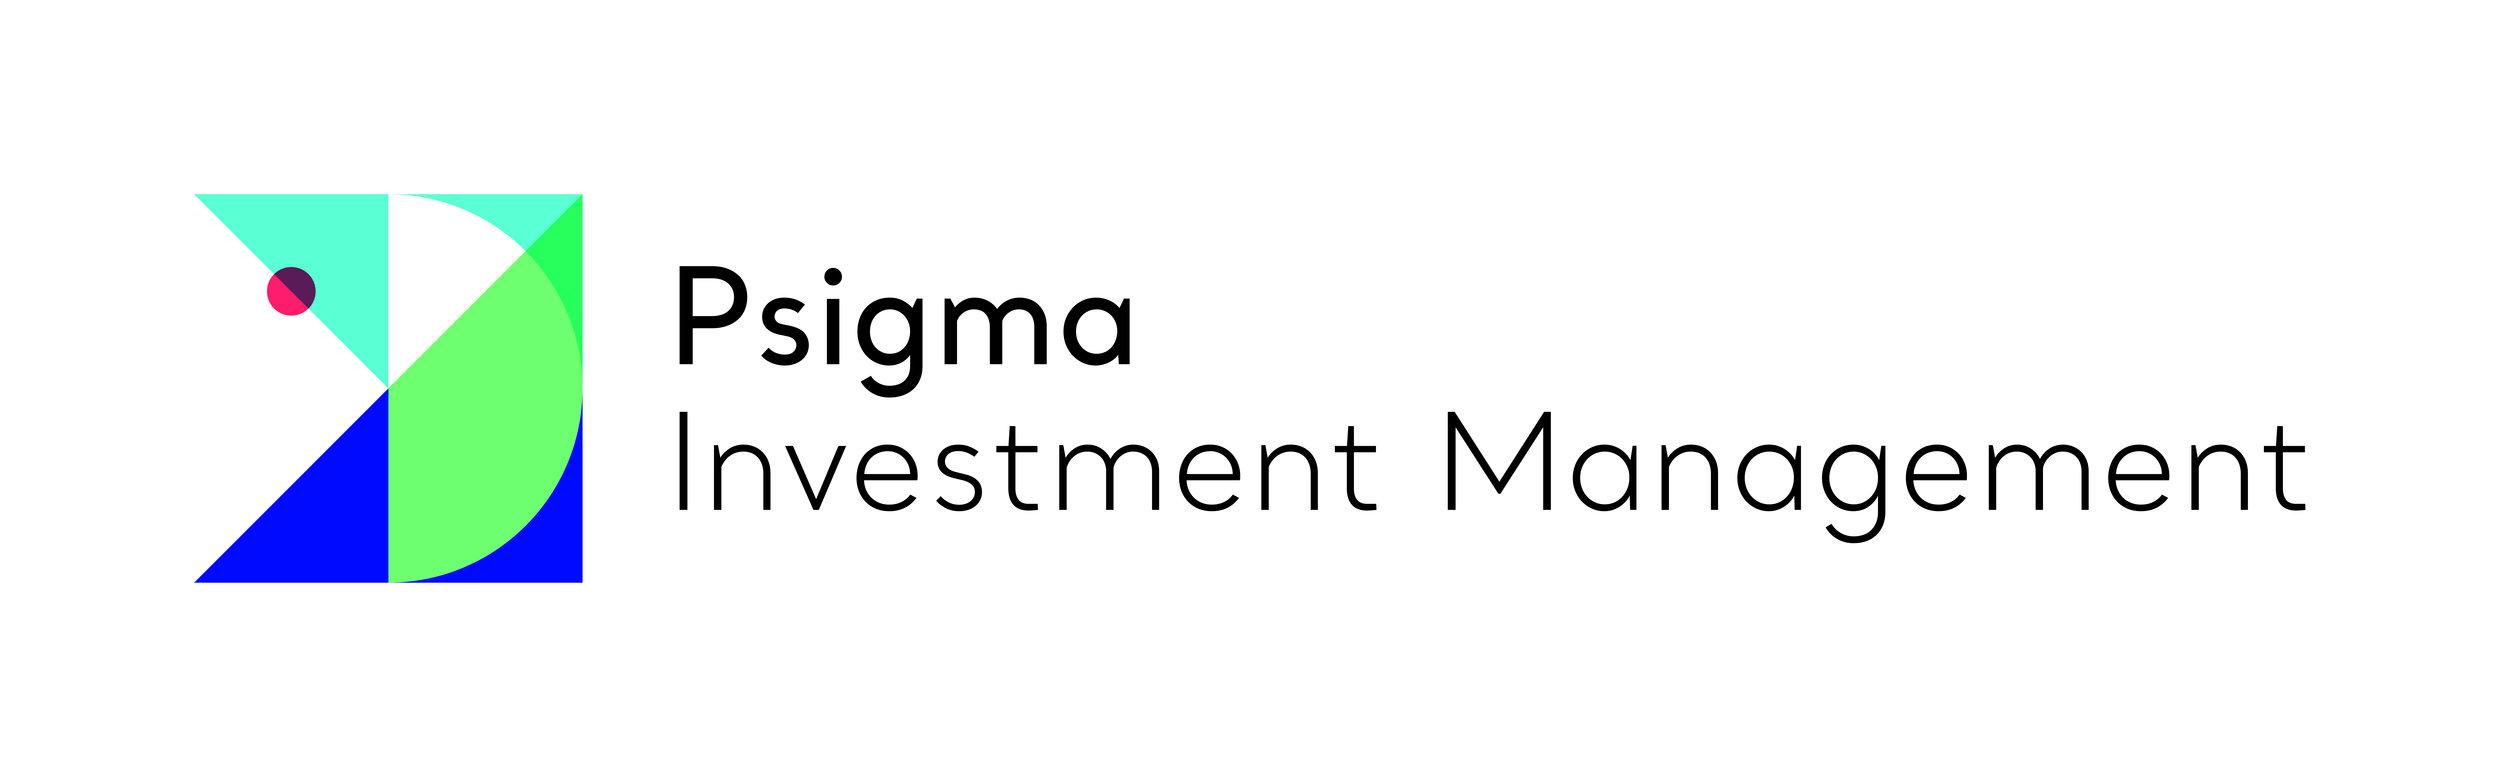 PS_Psigma_Horizontal_Logo_CMYK.JPG